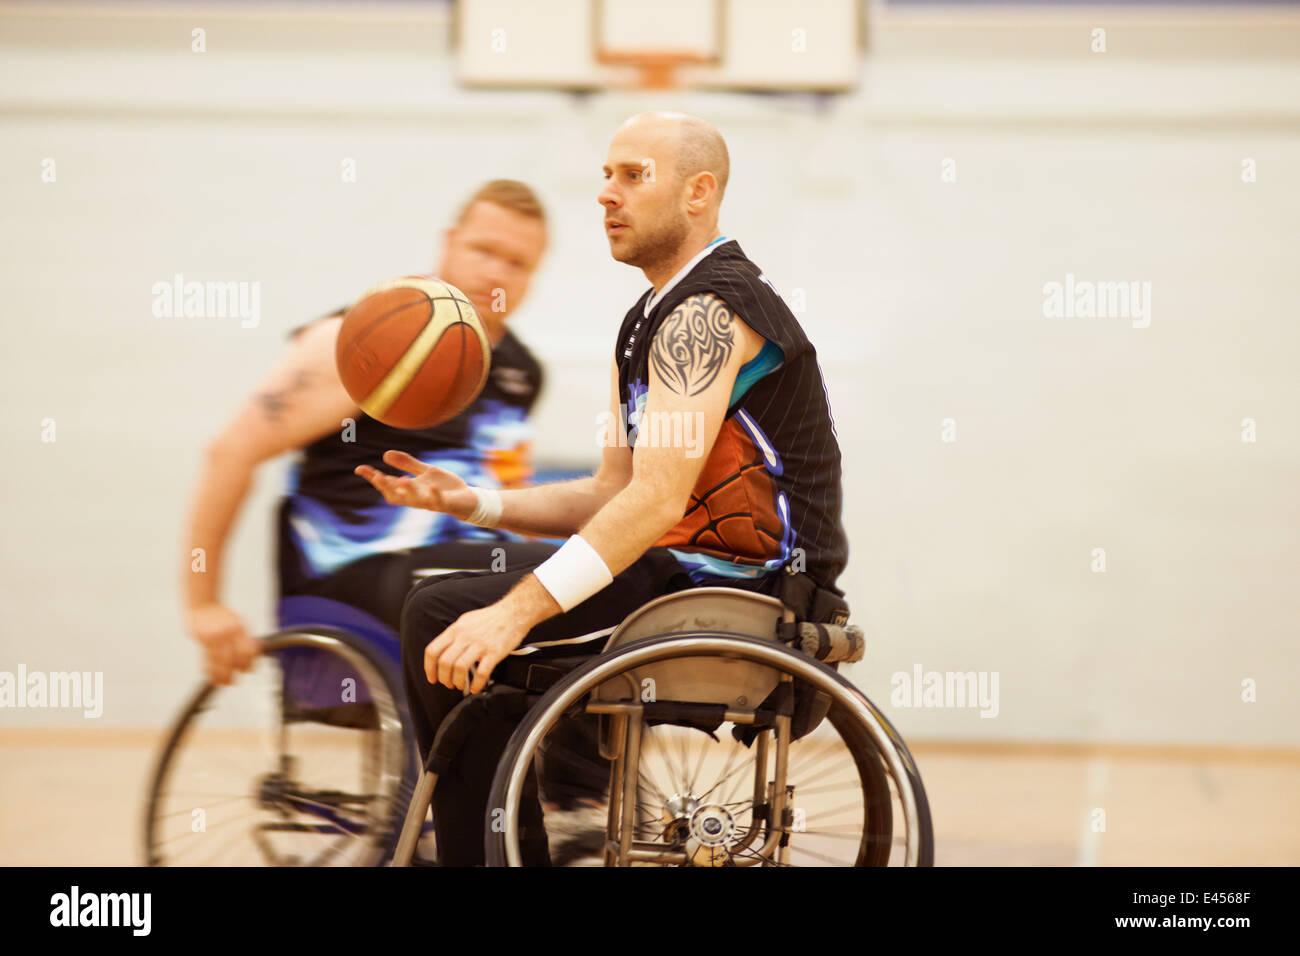 Wheelchair basketball player bouncing ball - Stock Image